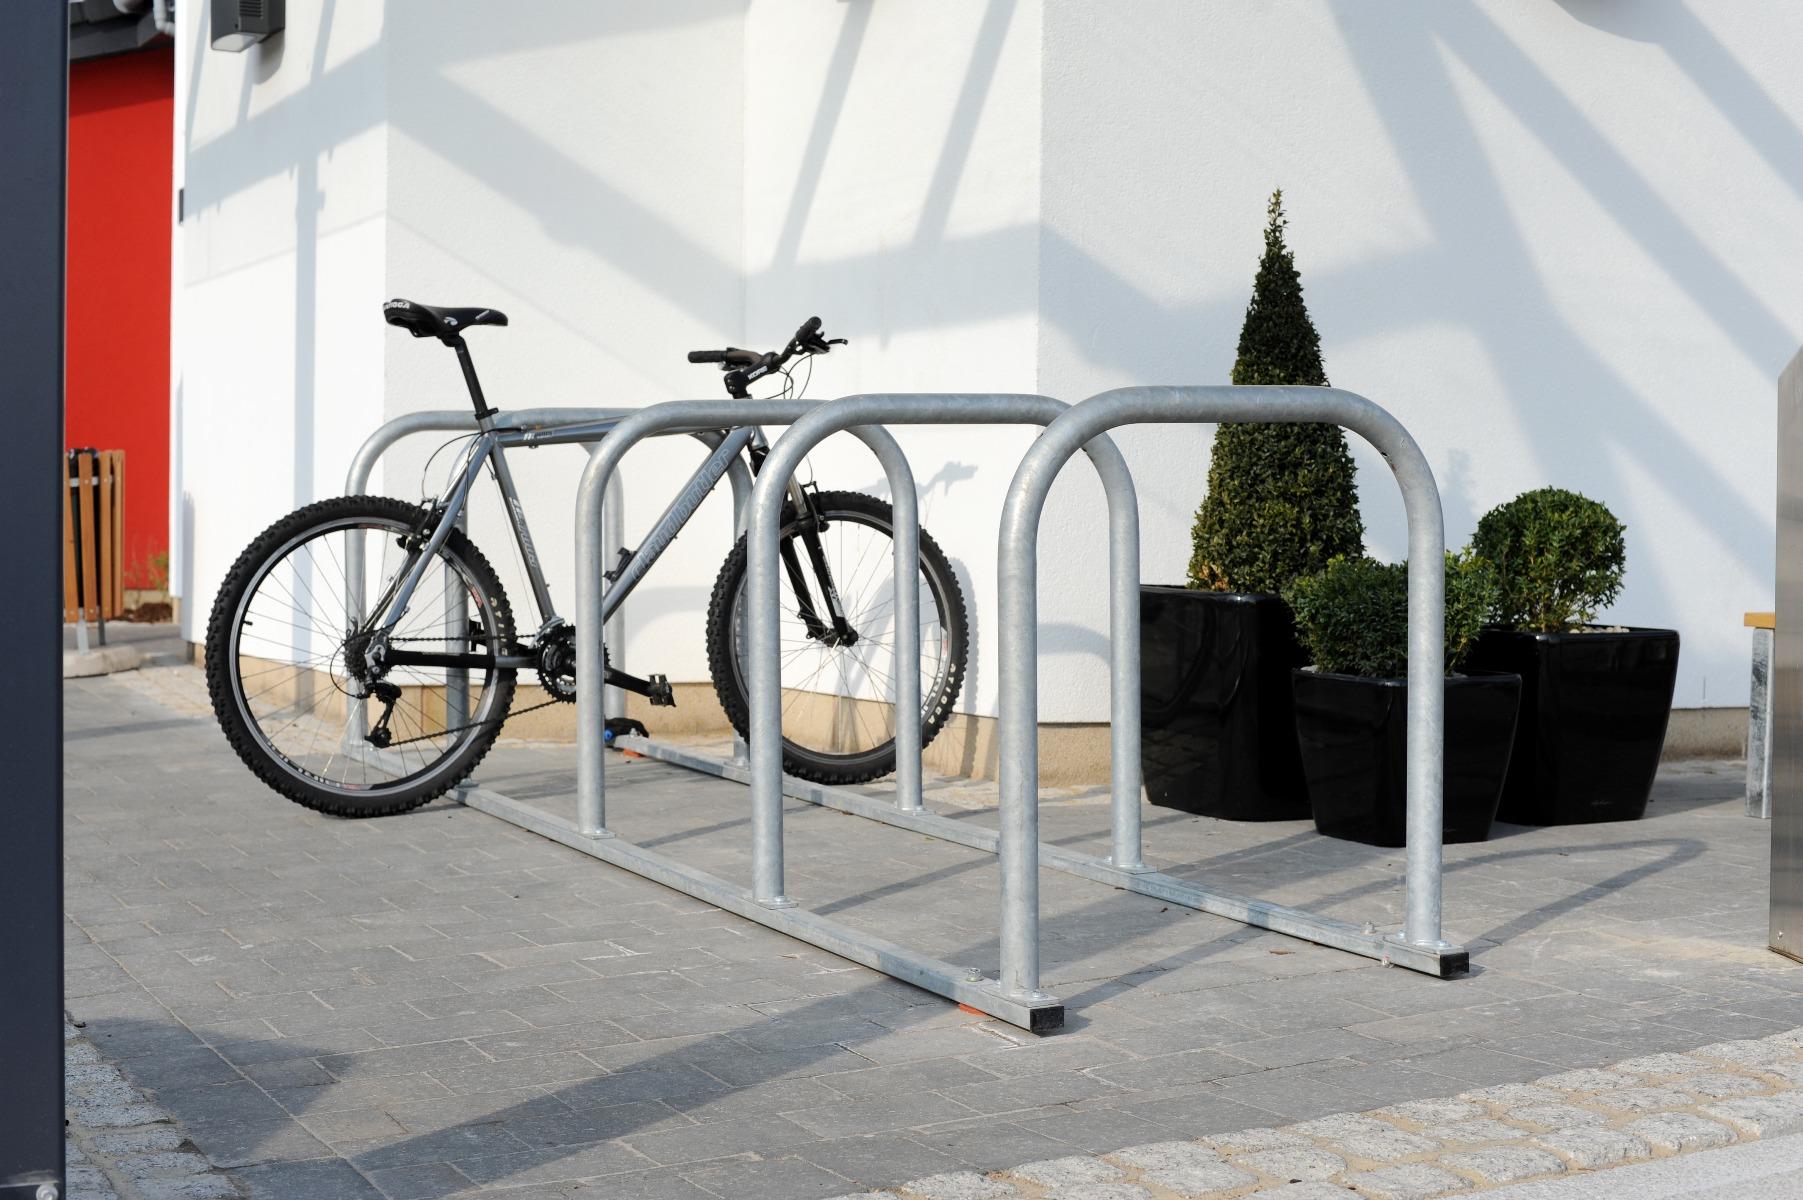 Sheffield Cycle Rack